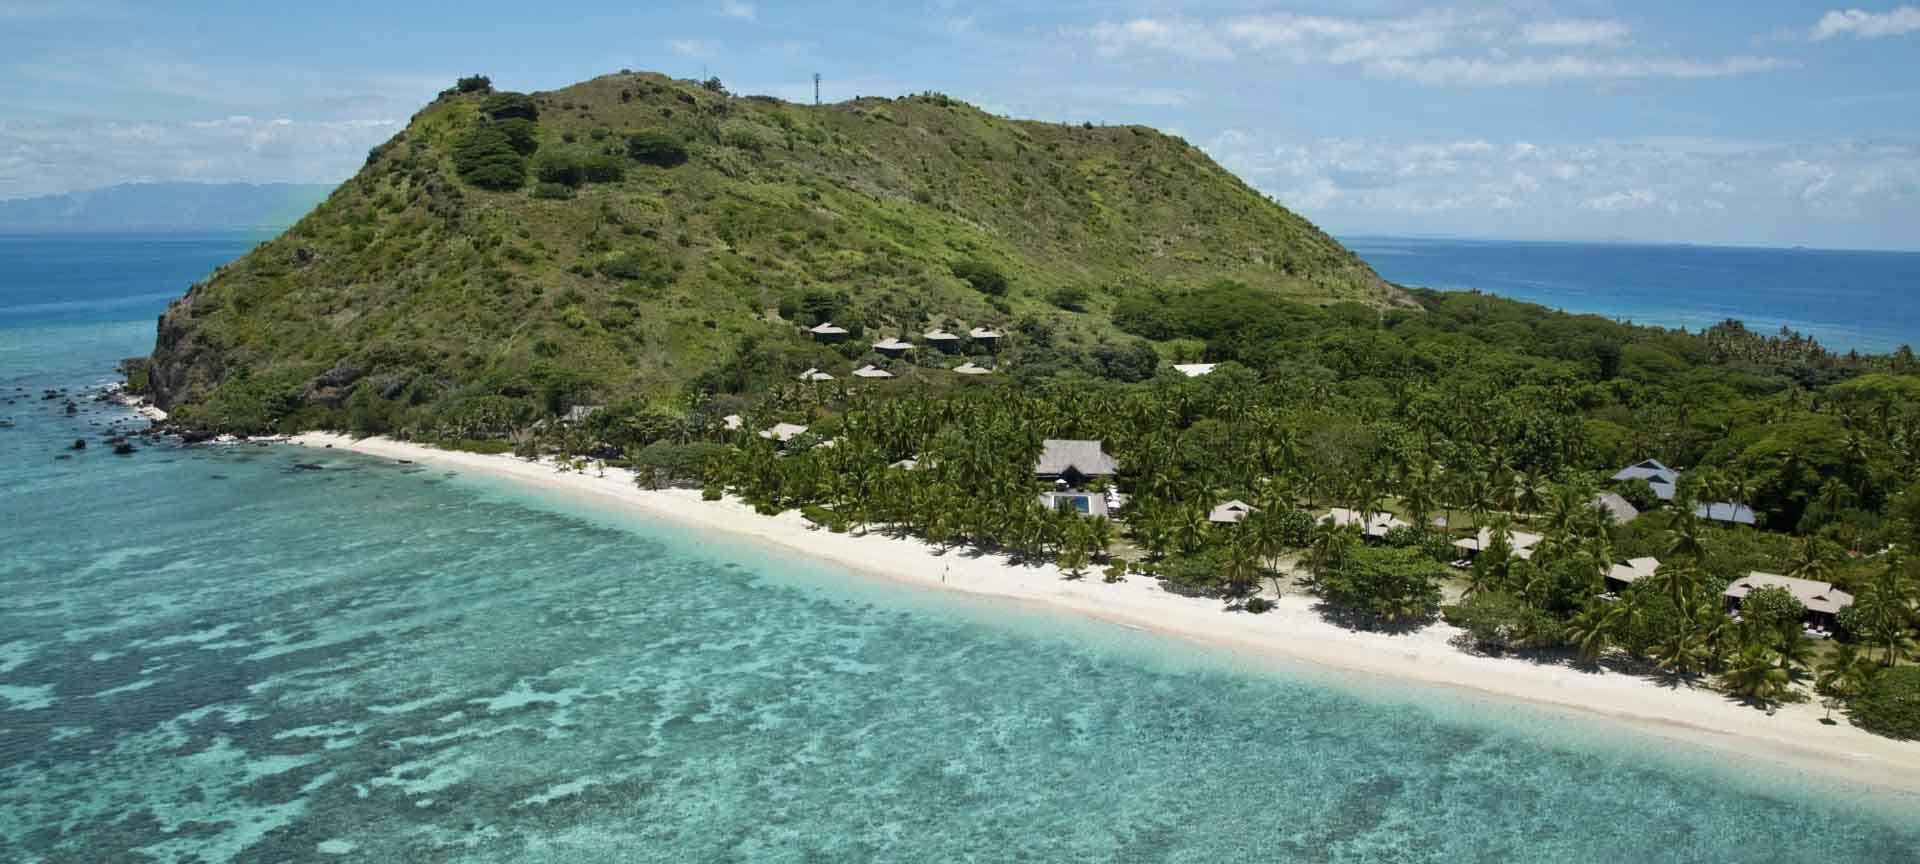 5c1390c721acd-vomo_island_resort_4_sup